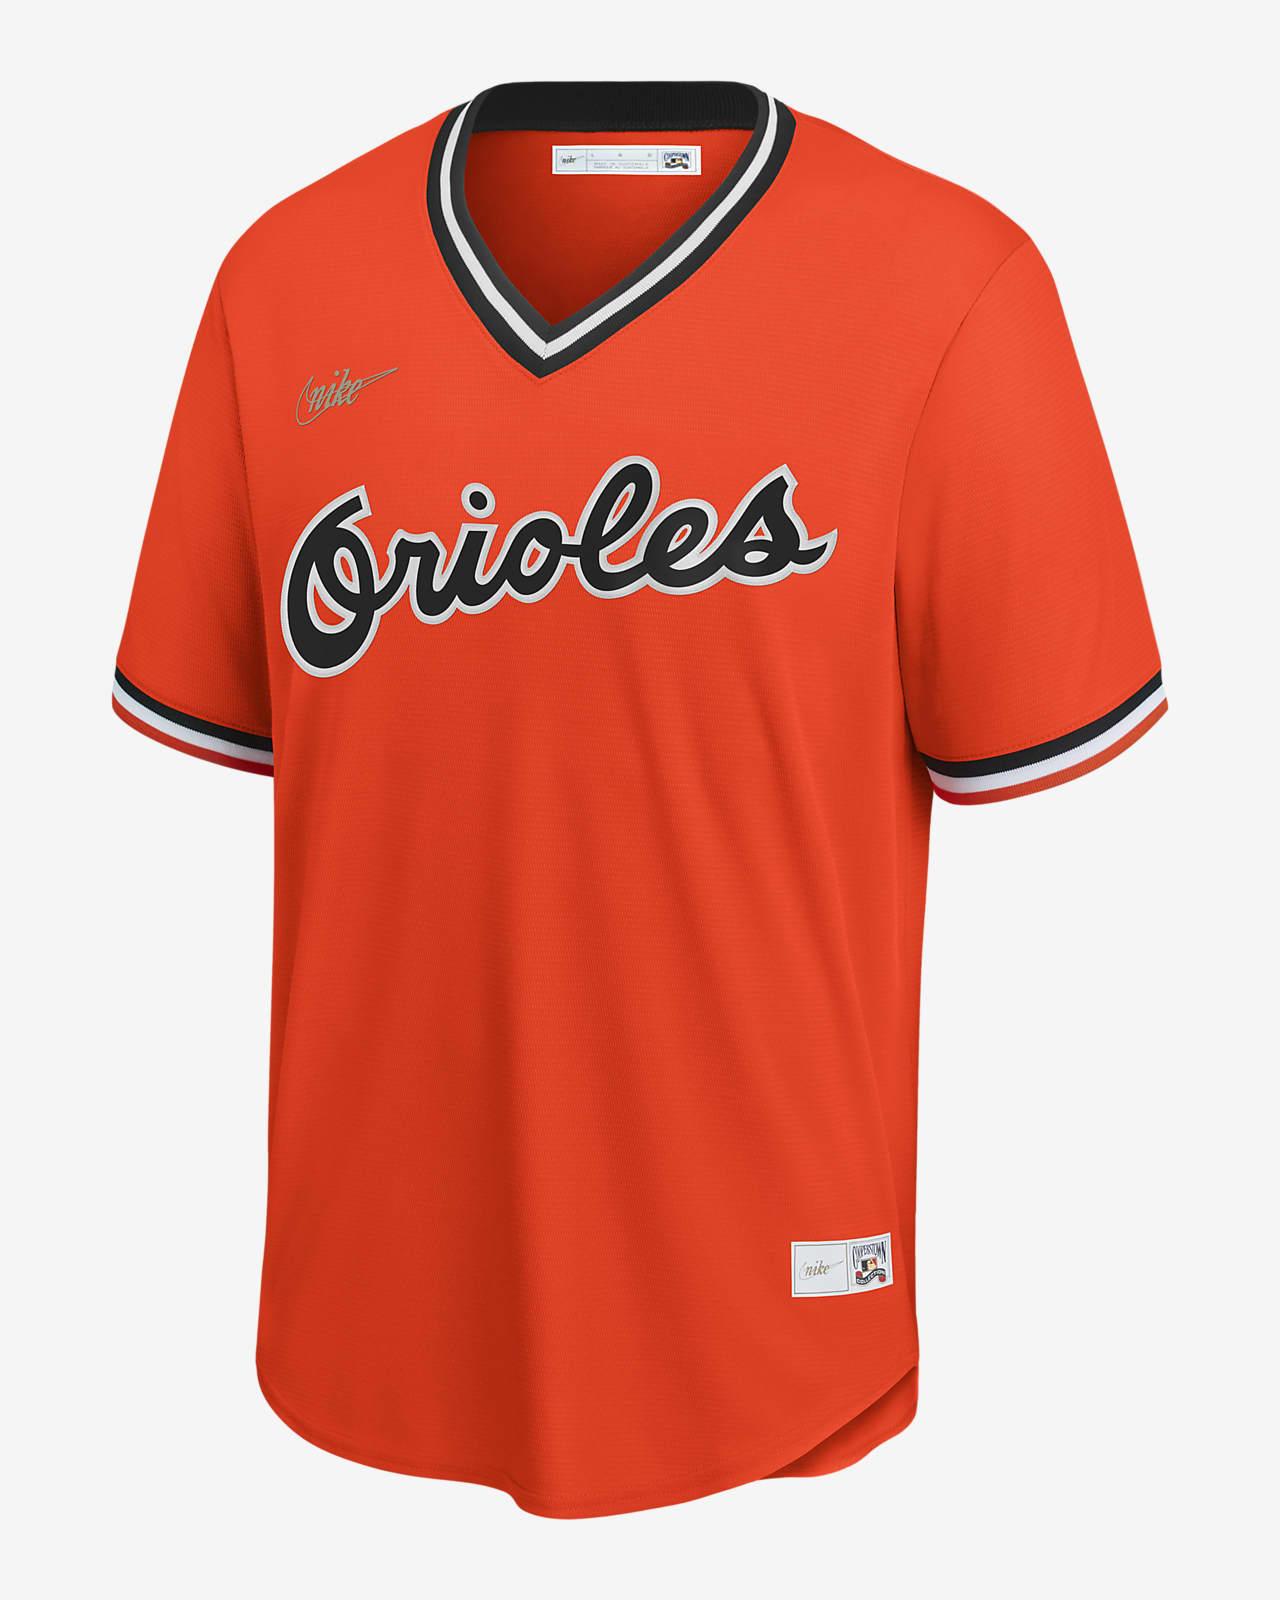 MLB Baltimore Orioles Men's Cooperstown Baseball Jersey